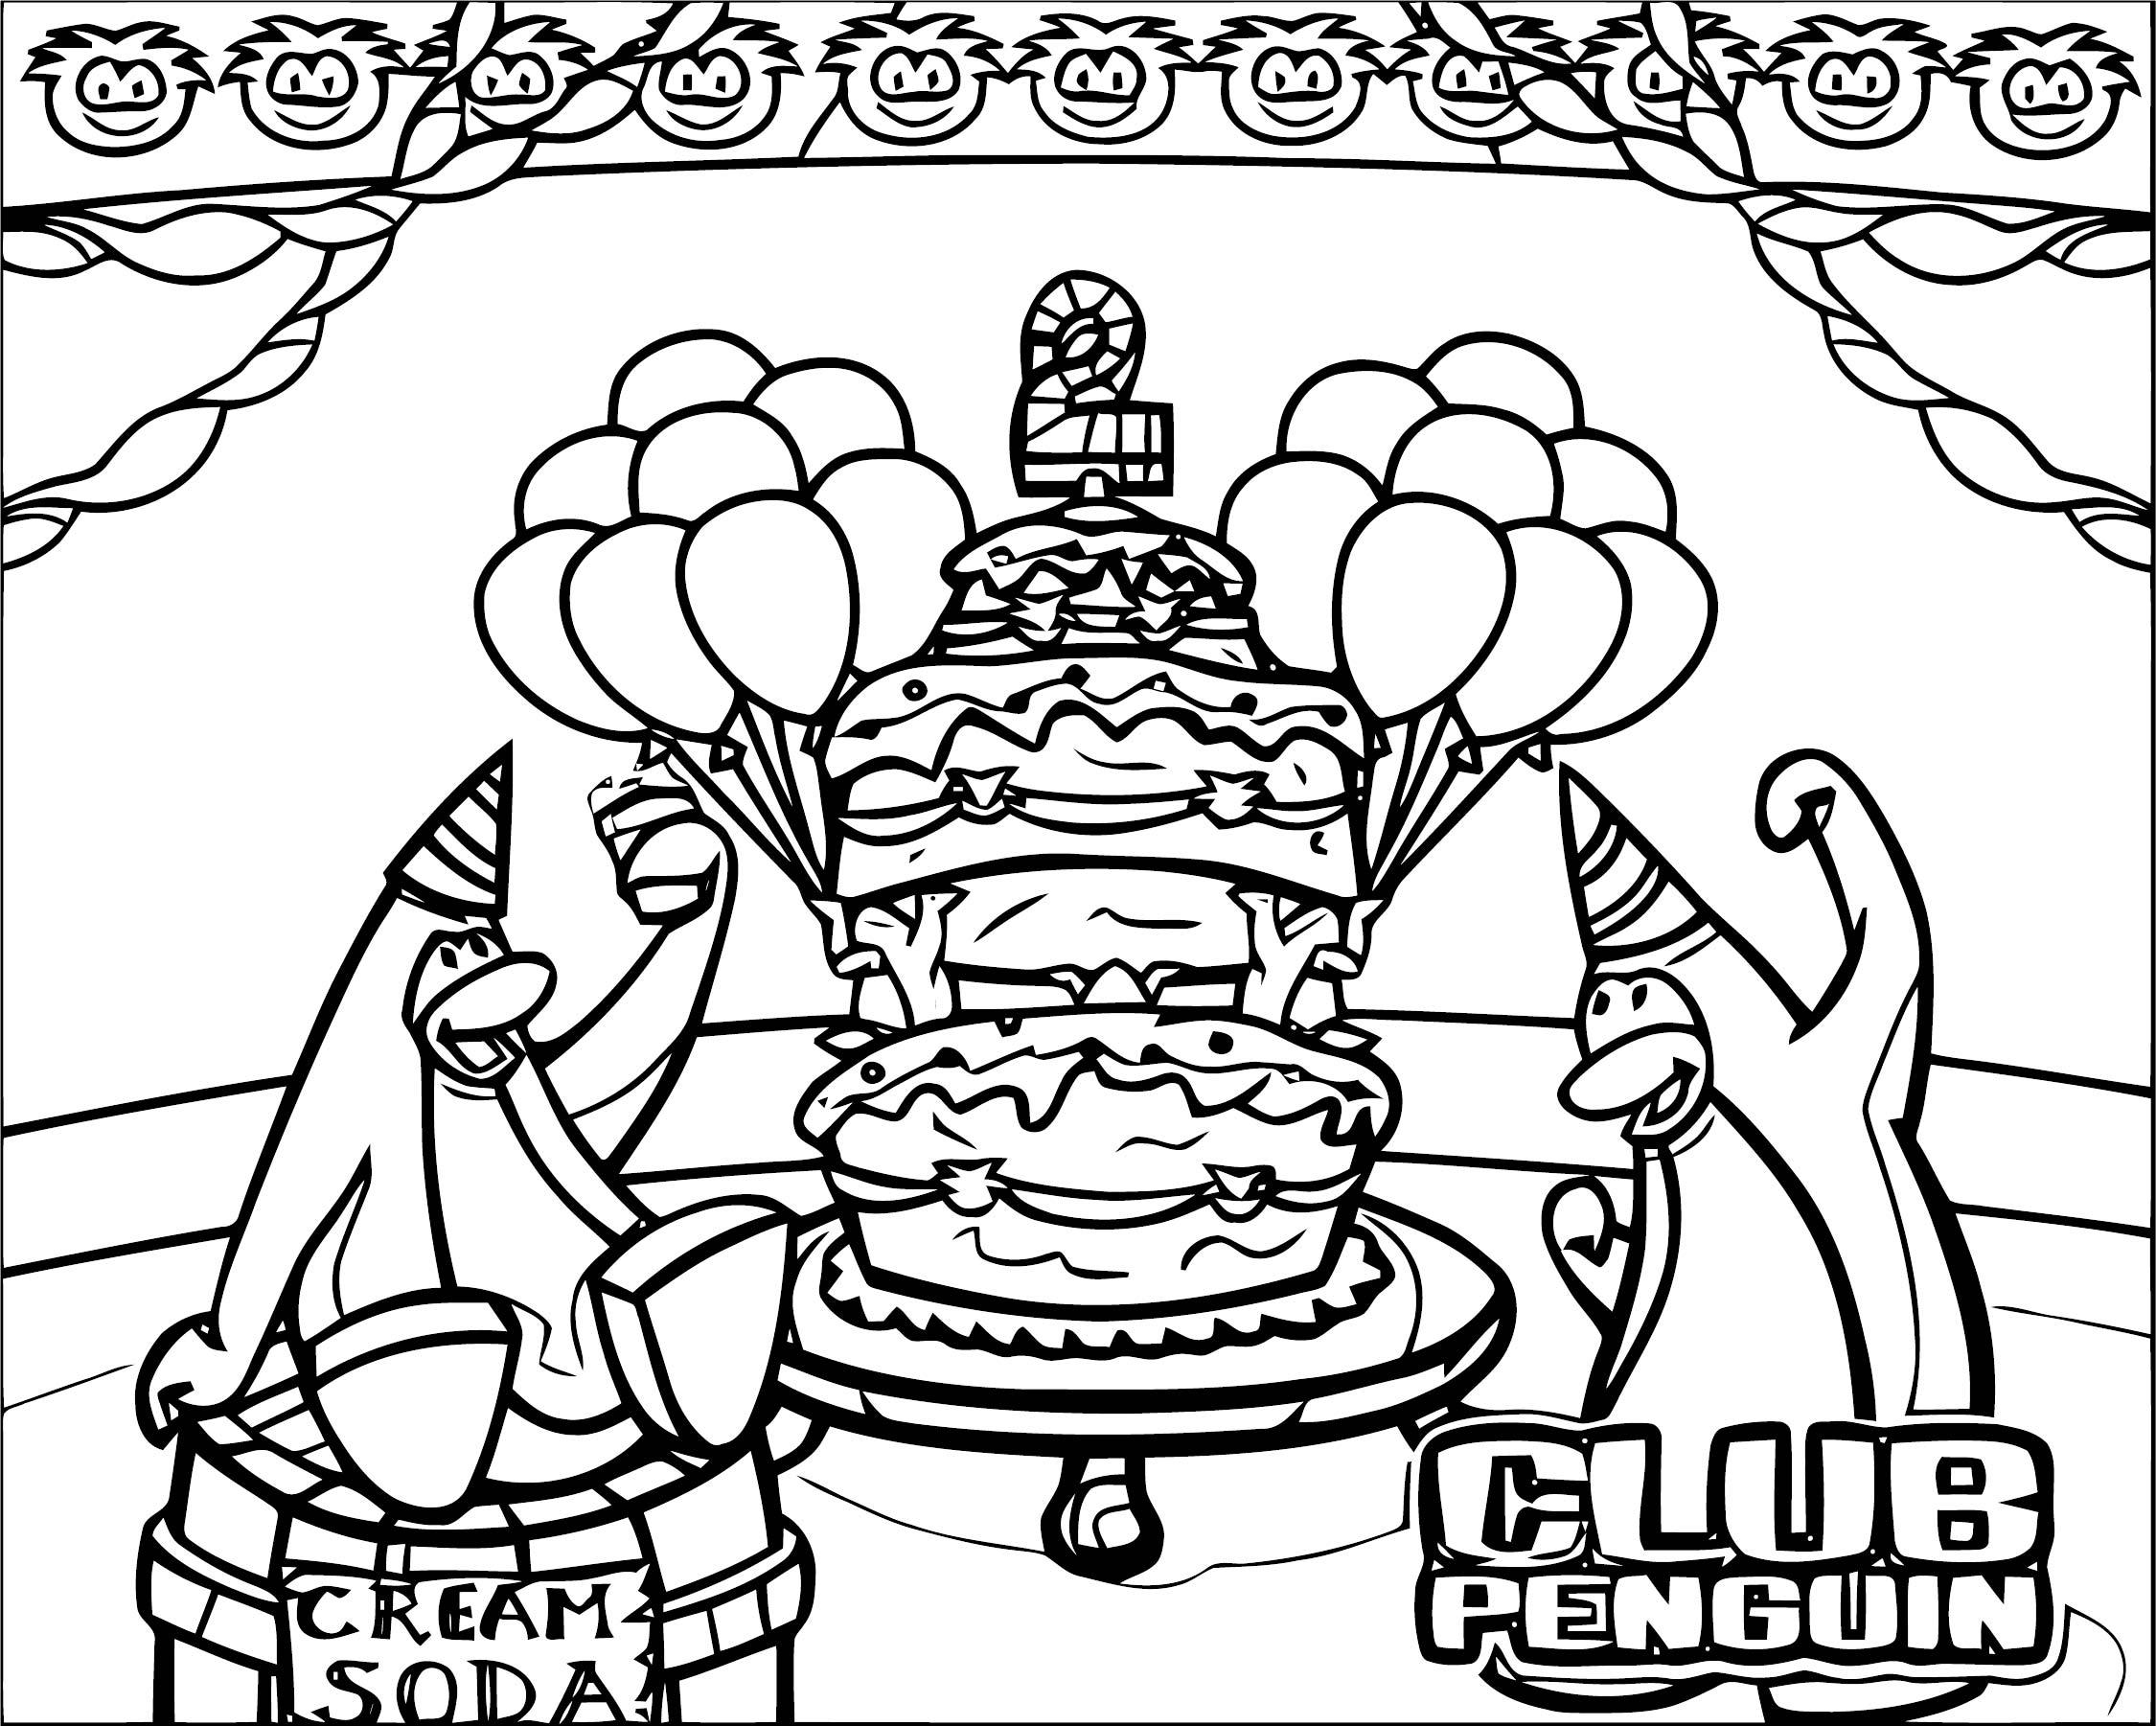 Club Penguin 17 ClubPenguin 1 Coloring Page